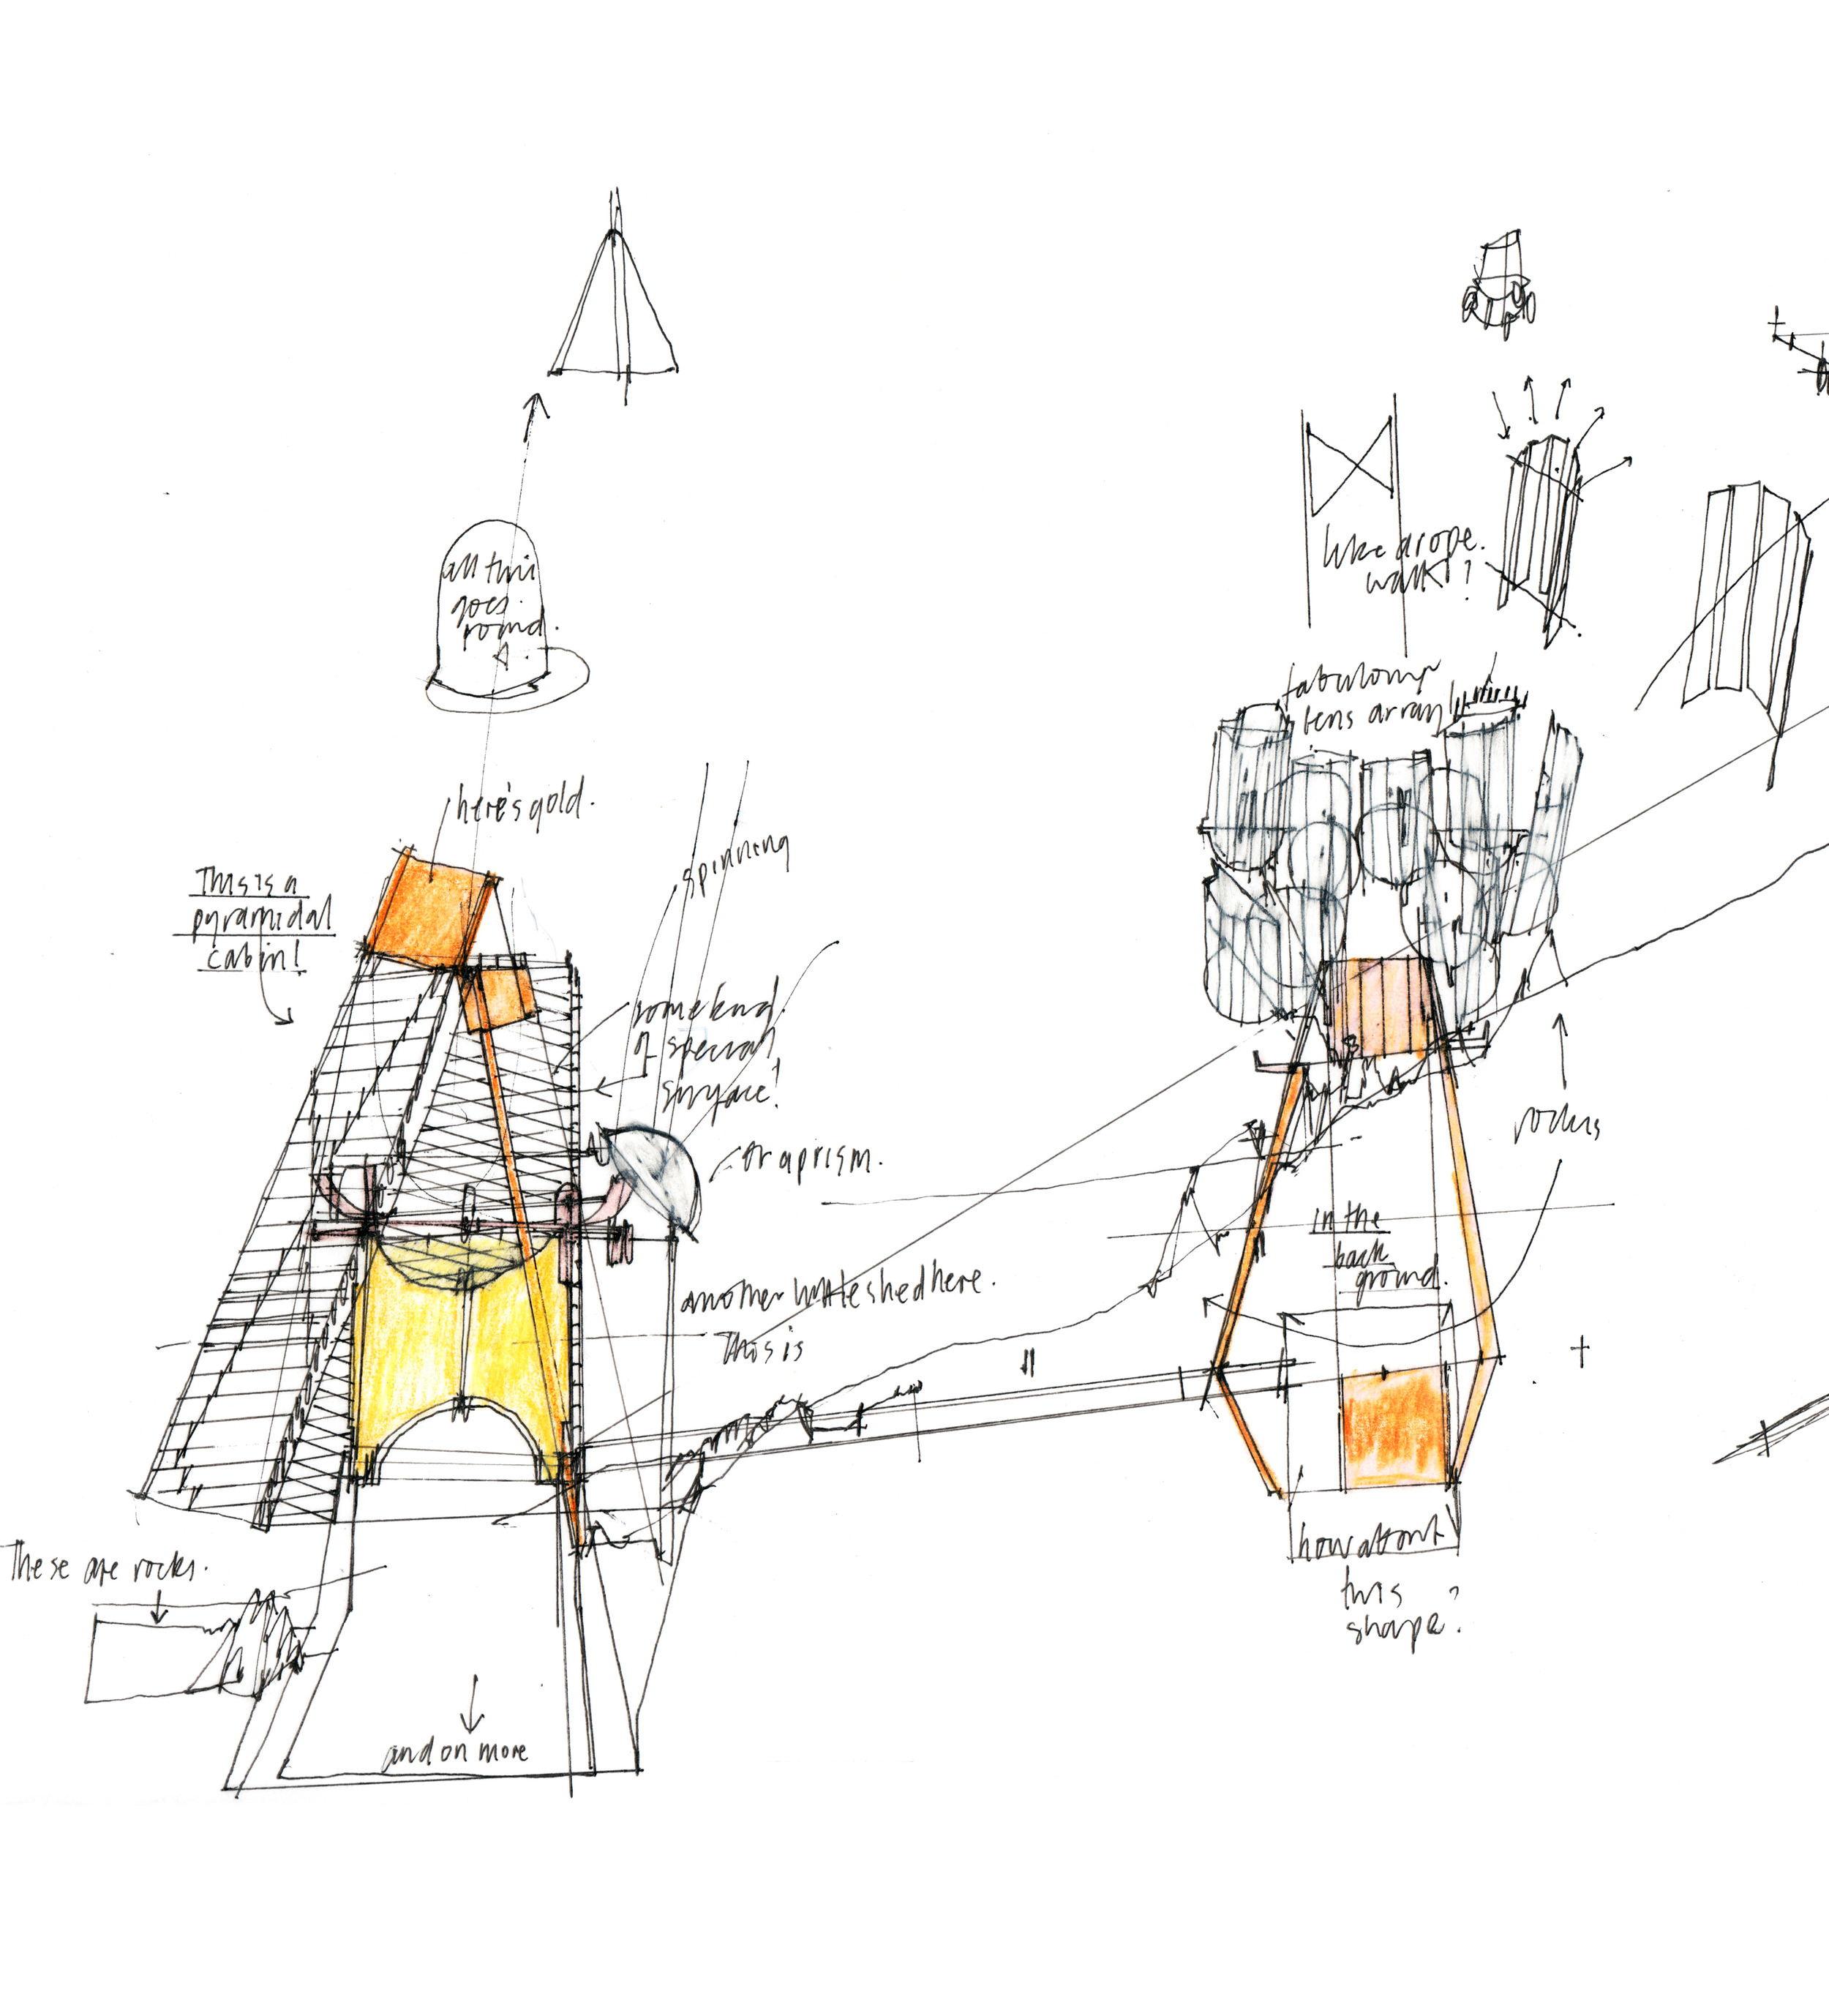 Speedof light sketch.jpg